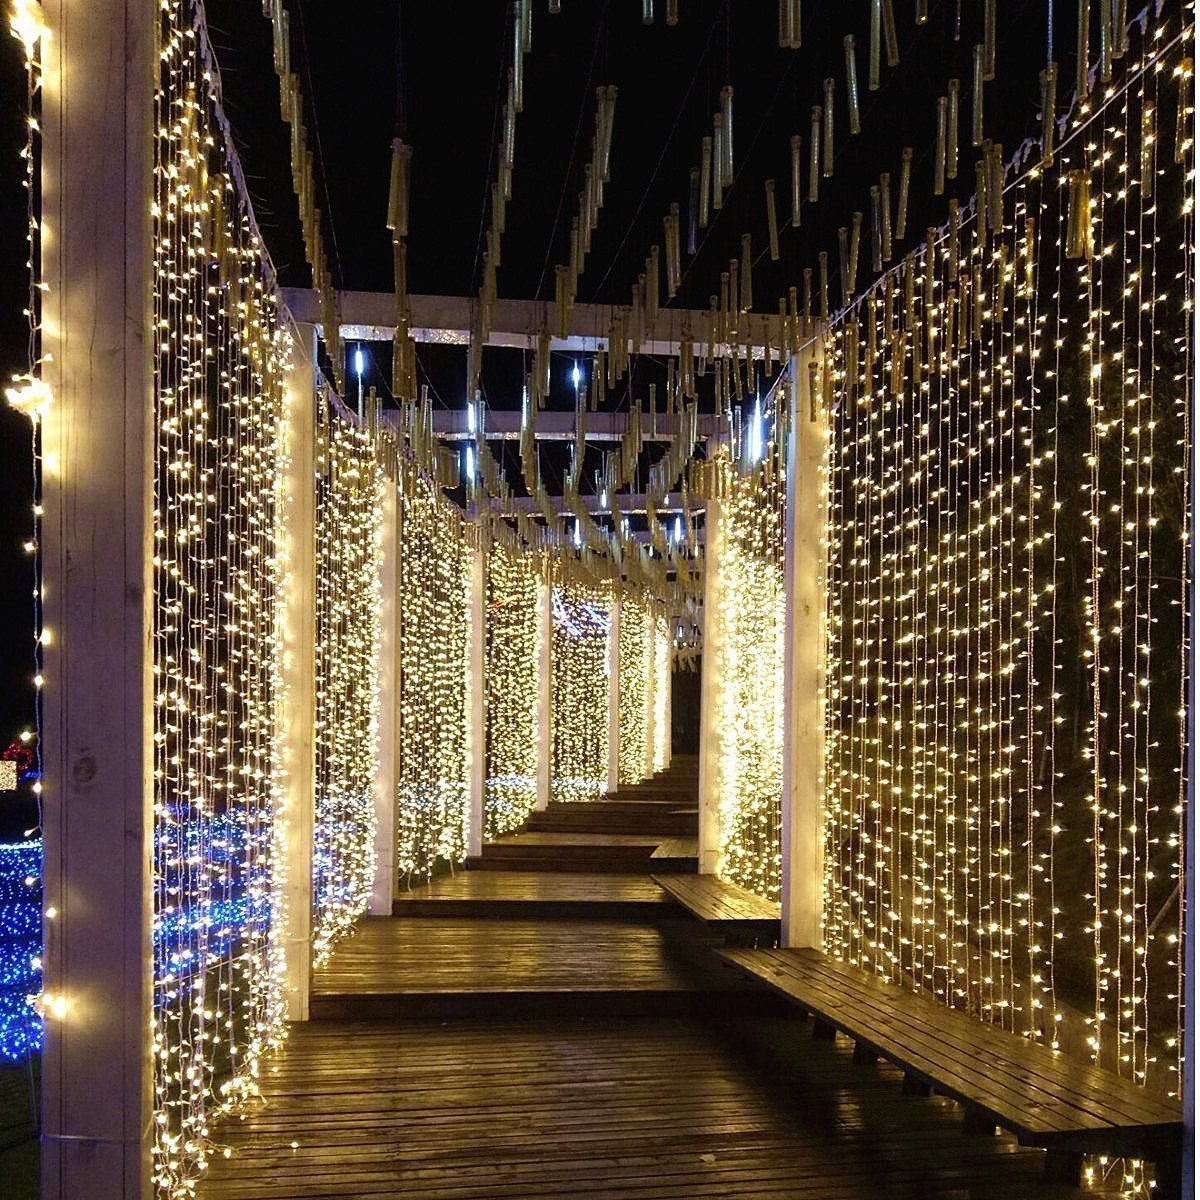 Светодиодные гирлянды LED 3 на 1,5 метра лед